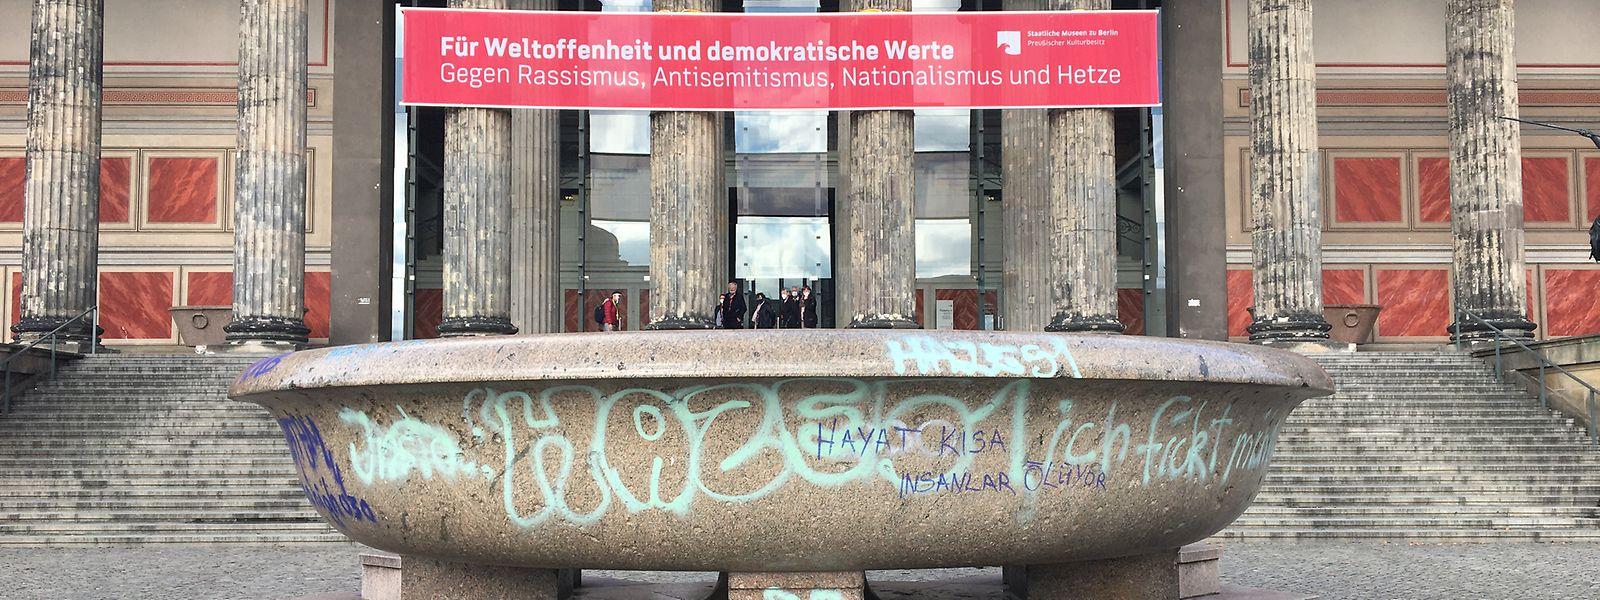 Berlin Erneuter Vandalismus Auf Museumsinsel